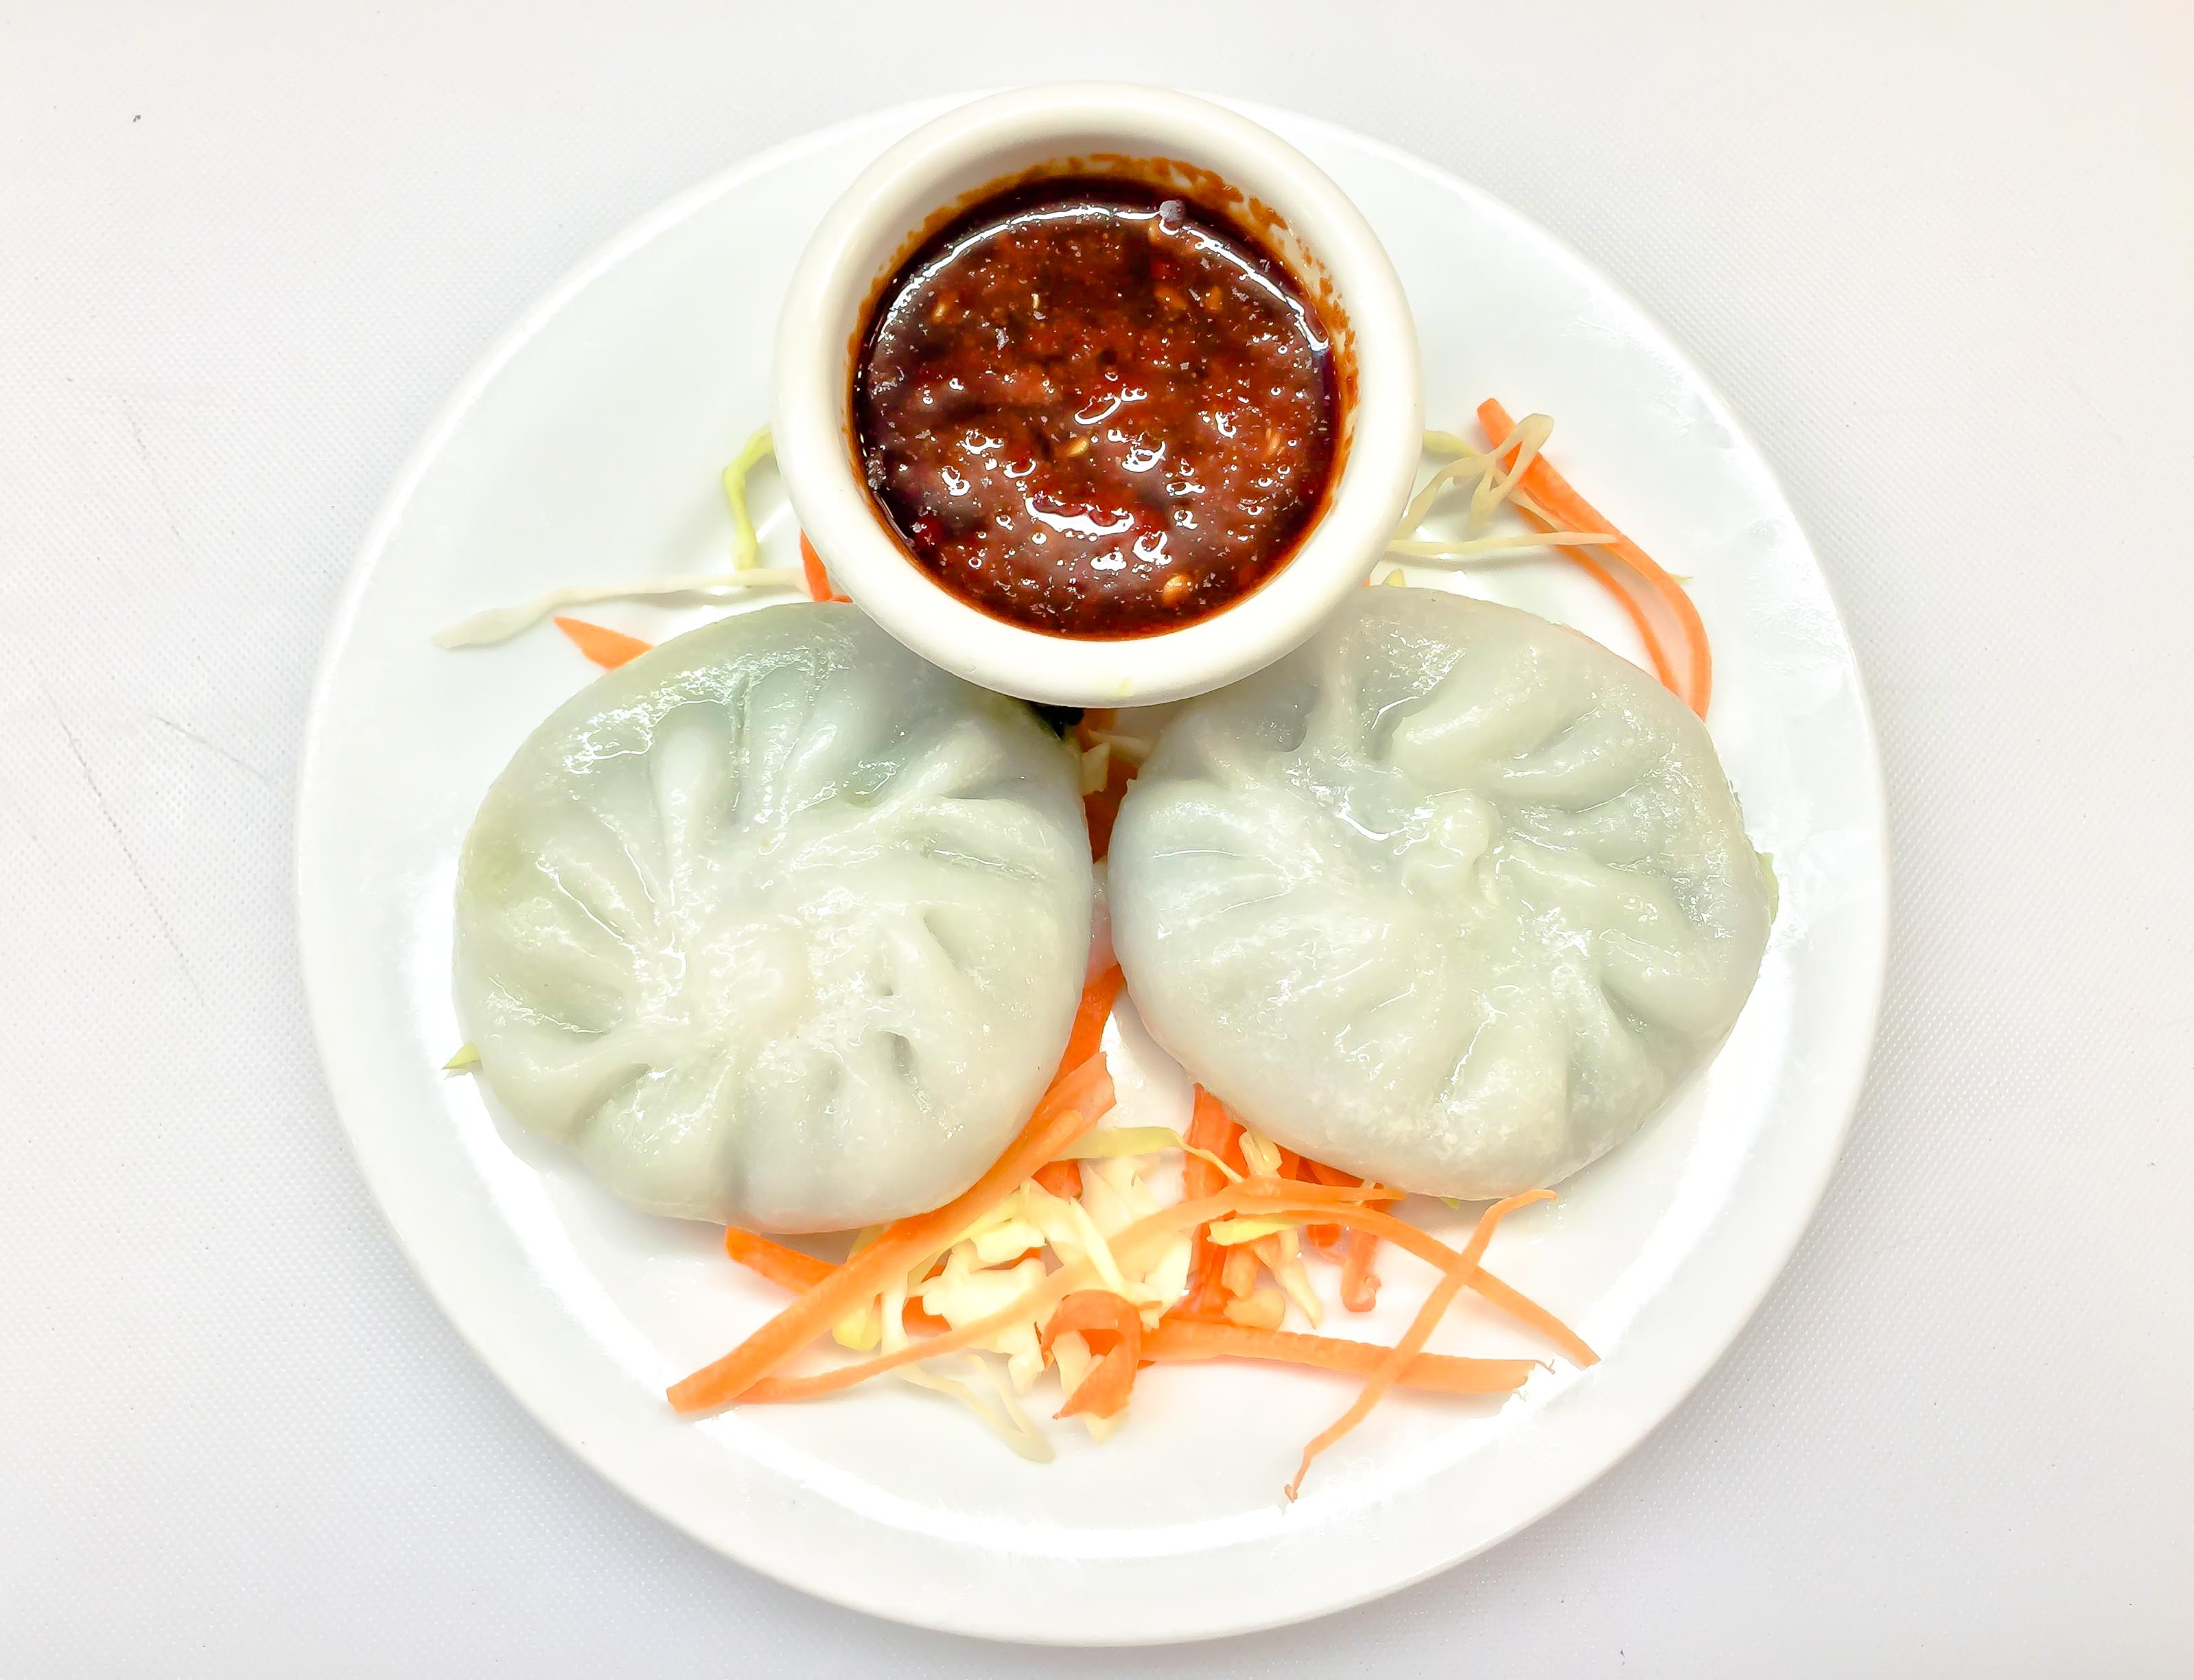 Steamed Chive Dumplings 3pcs Image